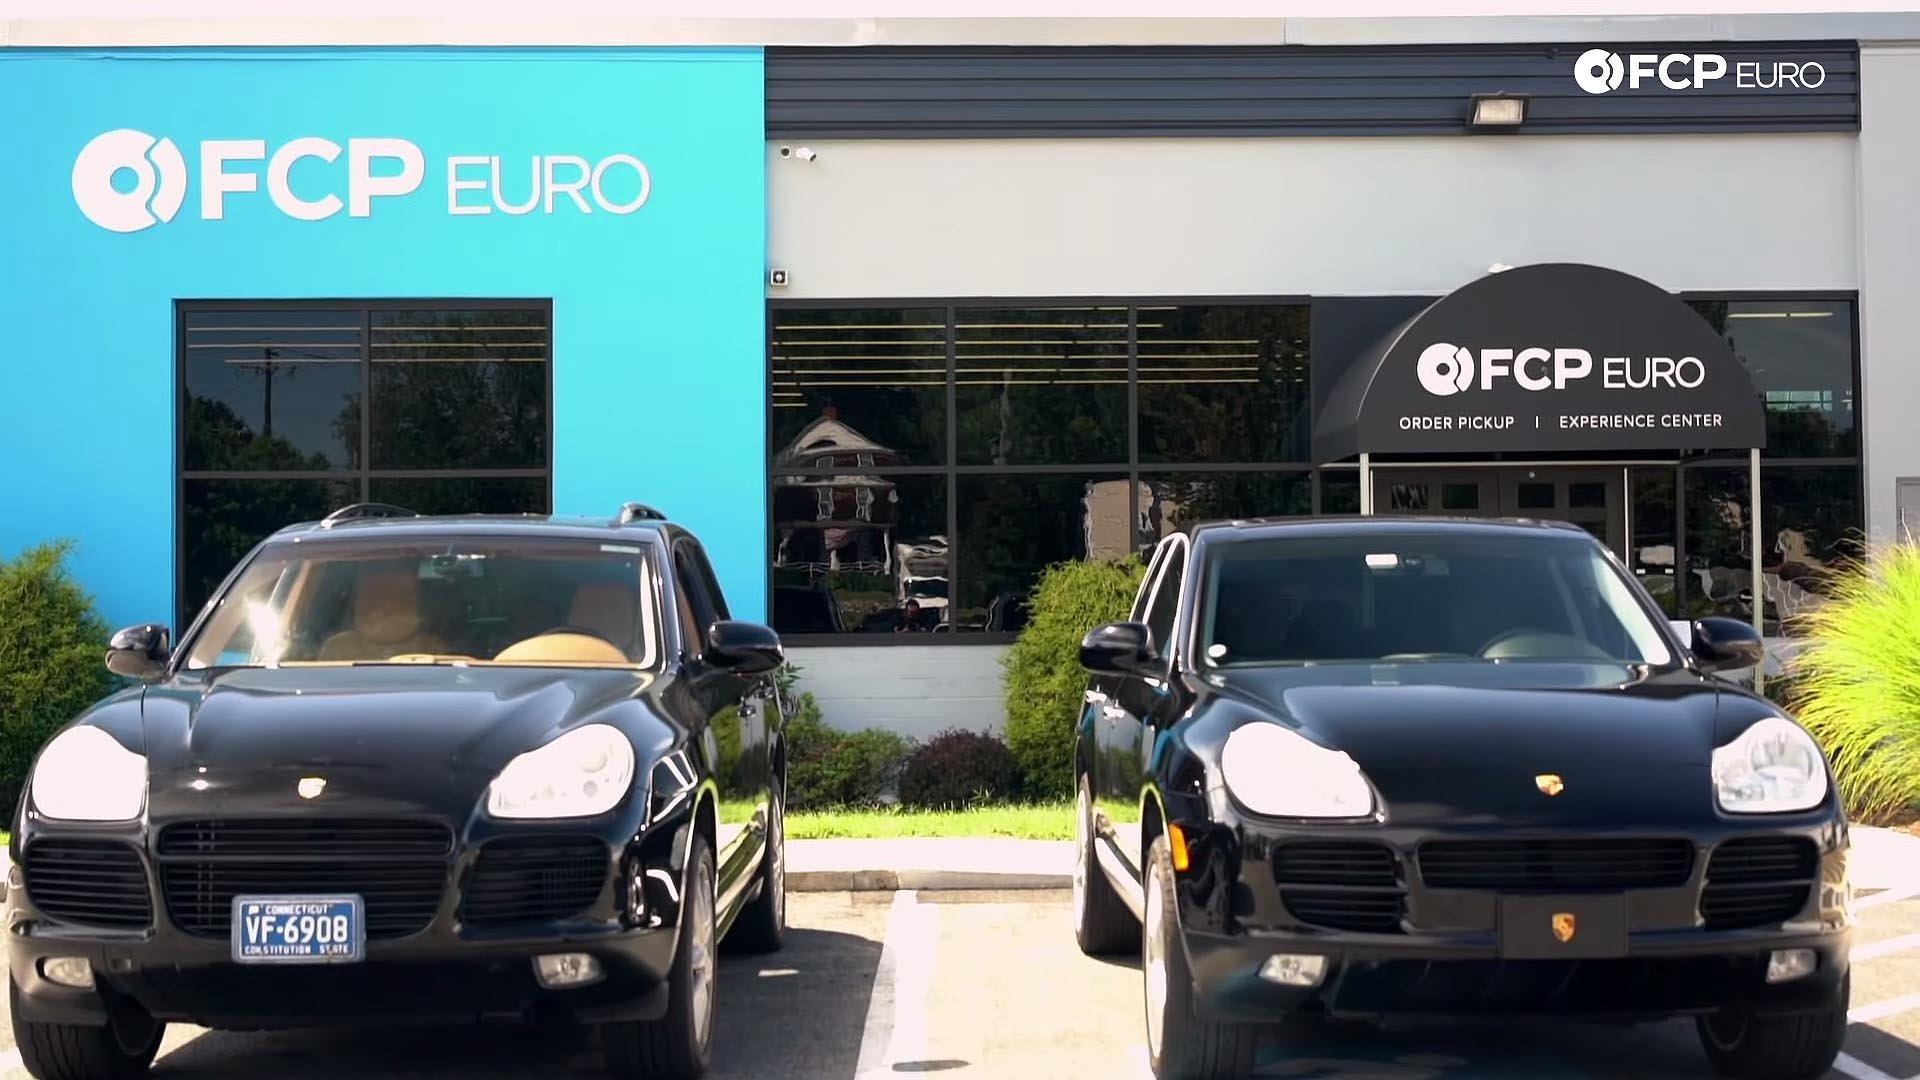 955 957 Porsche Cayenne buyers guide intro FCP Euro